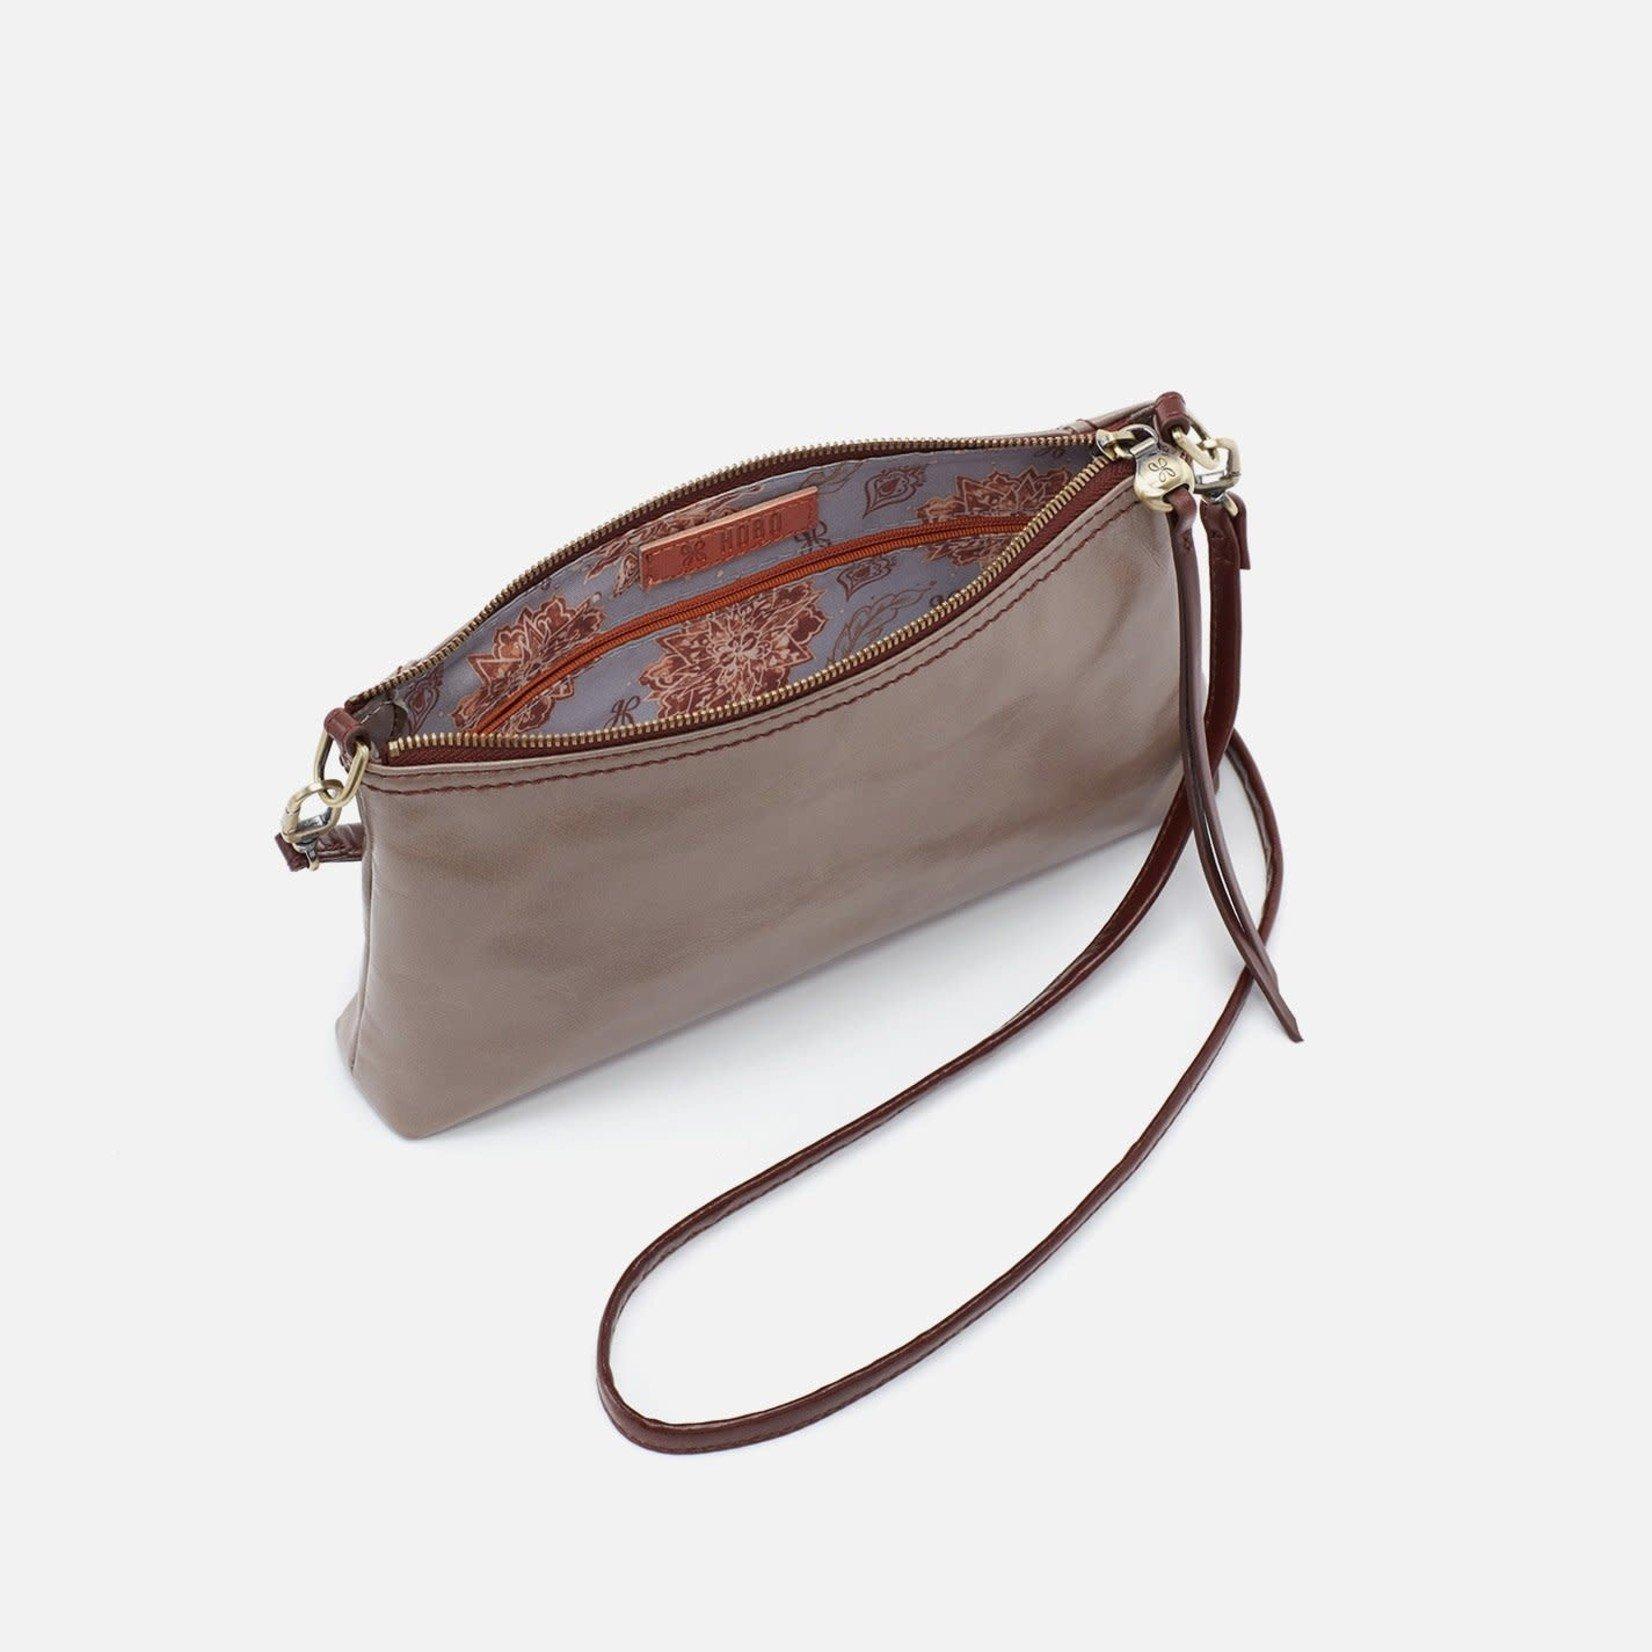 HOBO Darcy Ash Vintage Hide Leather Wristlet/Crossbody